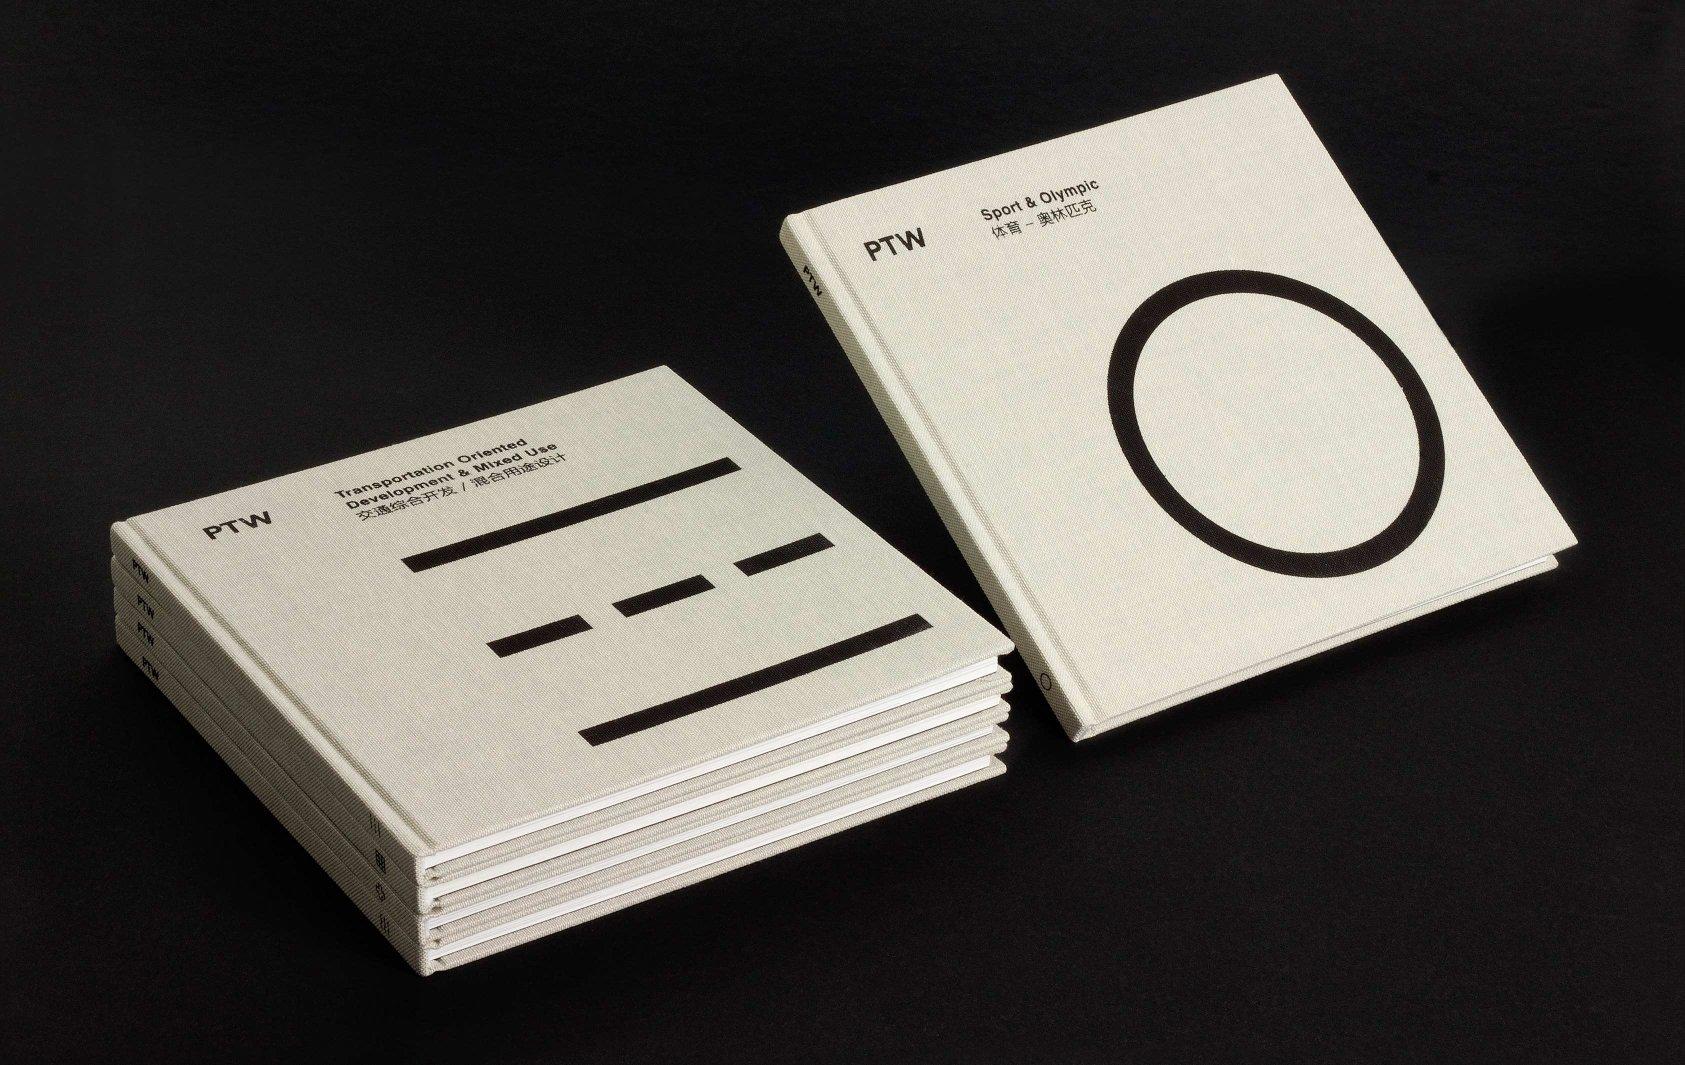 Design by Toko  | Present&Correct